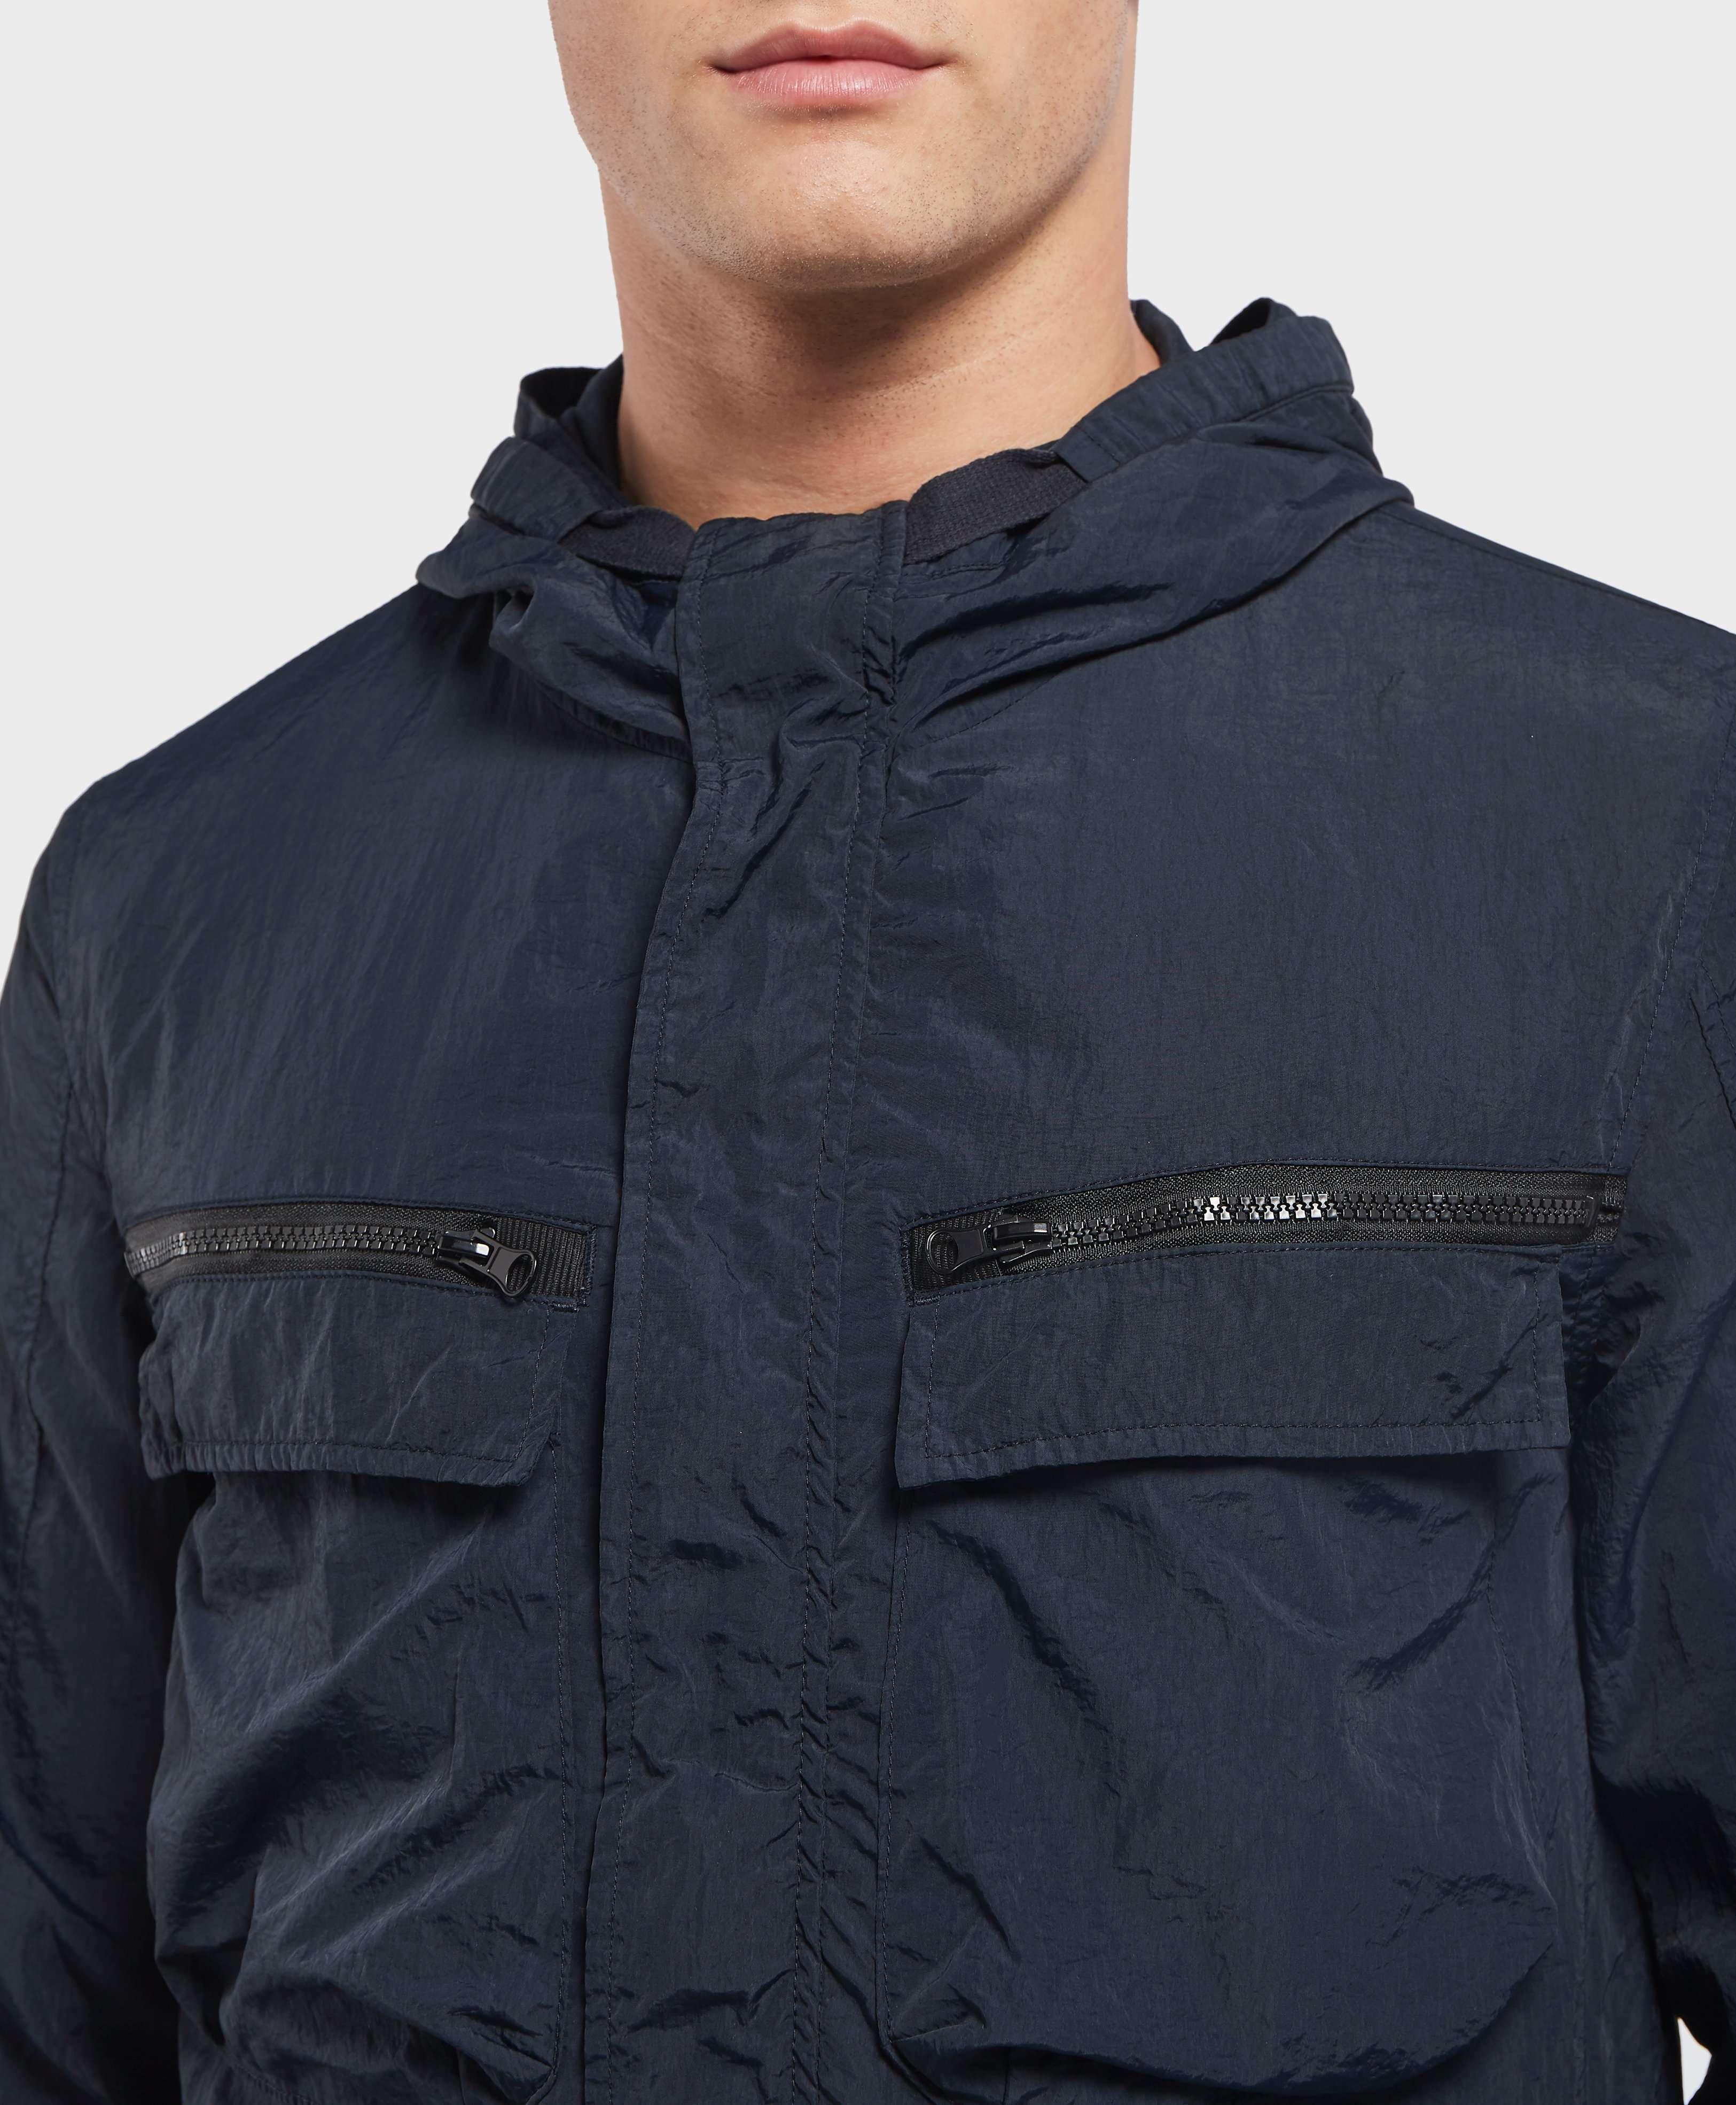 Marshall Artist Garment Dyed Field Jacket